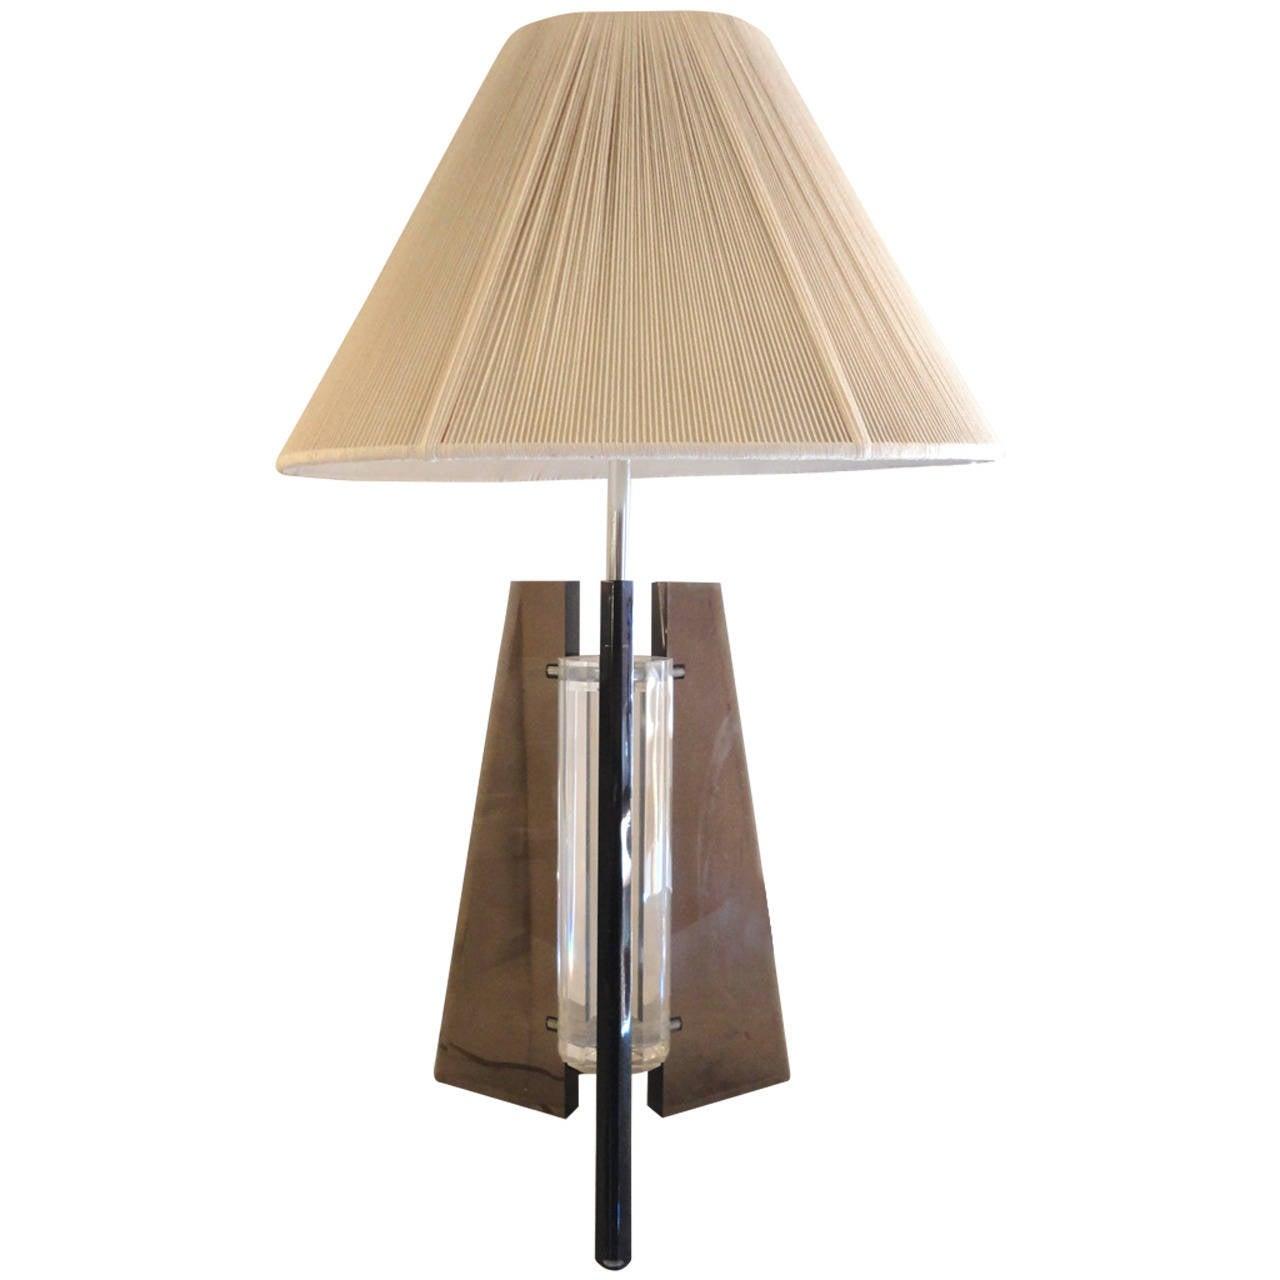 Striking Mid-Century Lucite Lamp